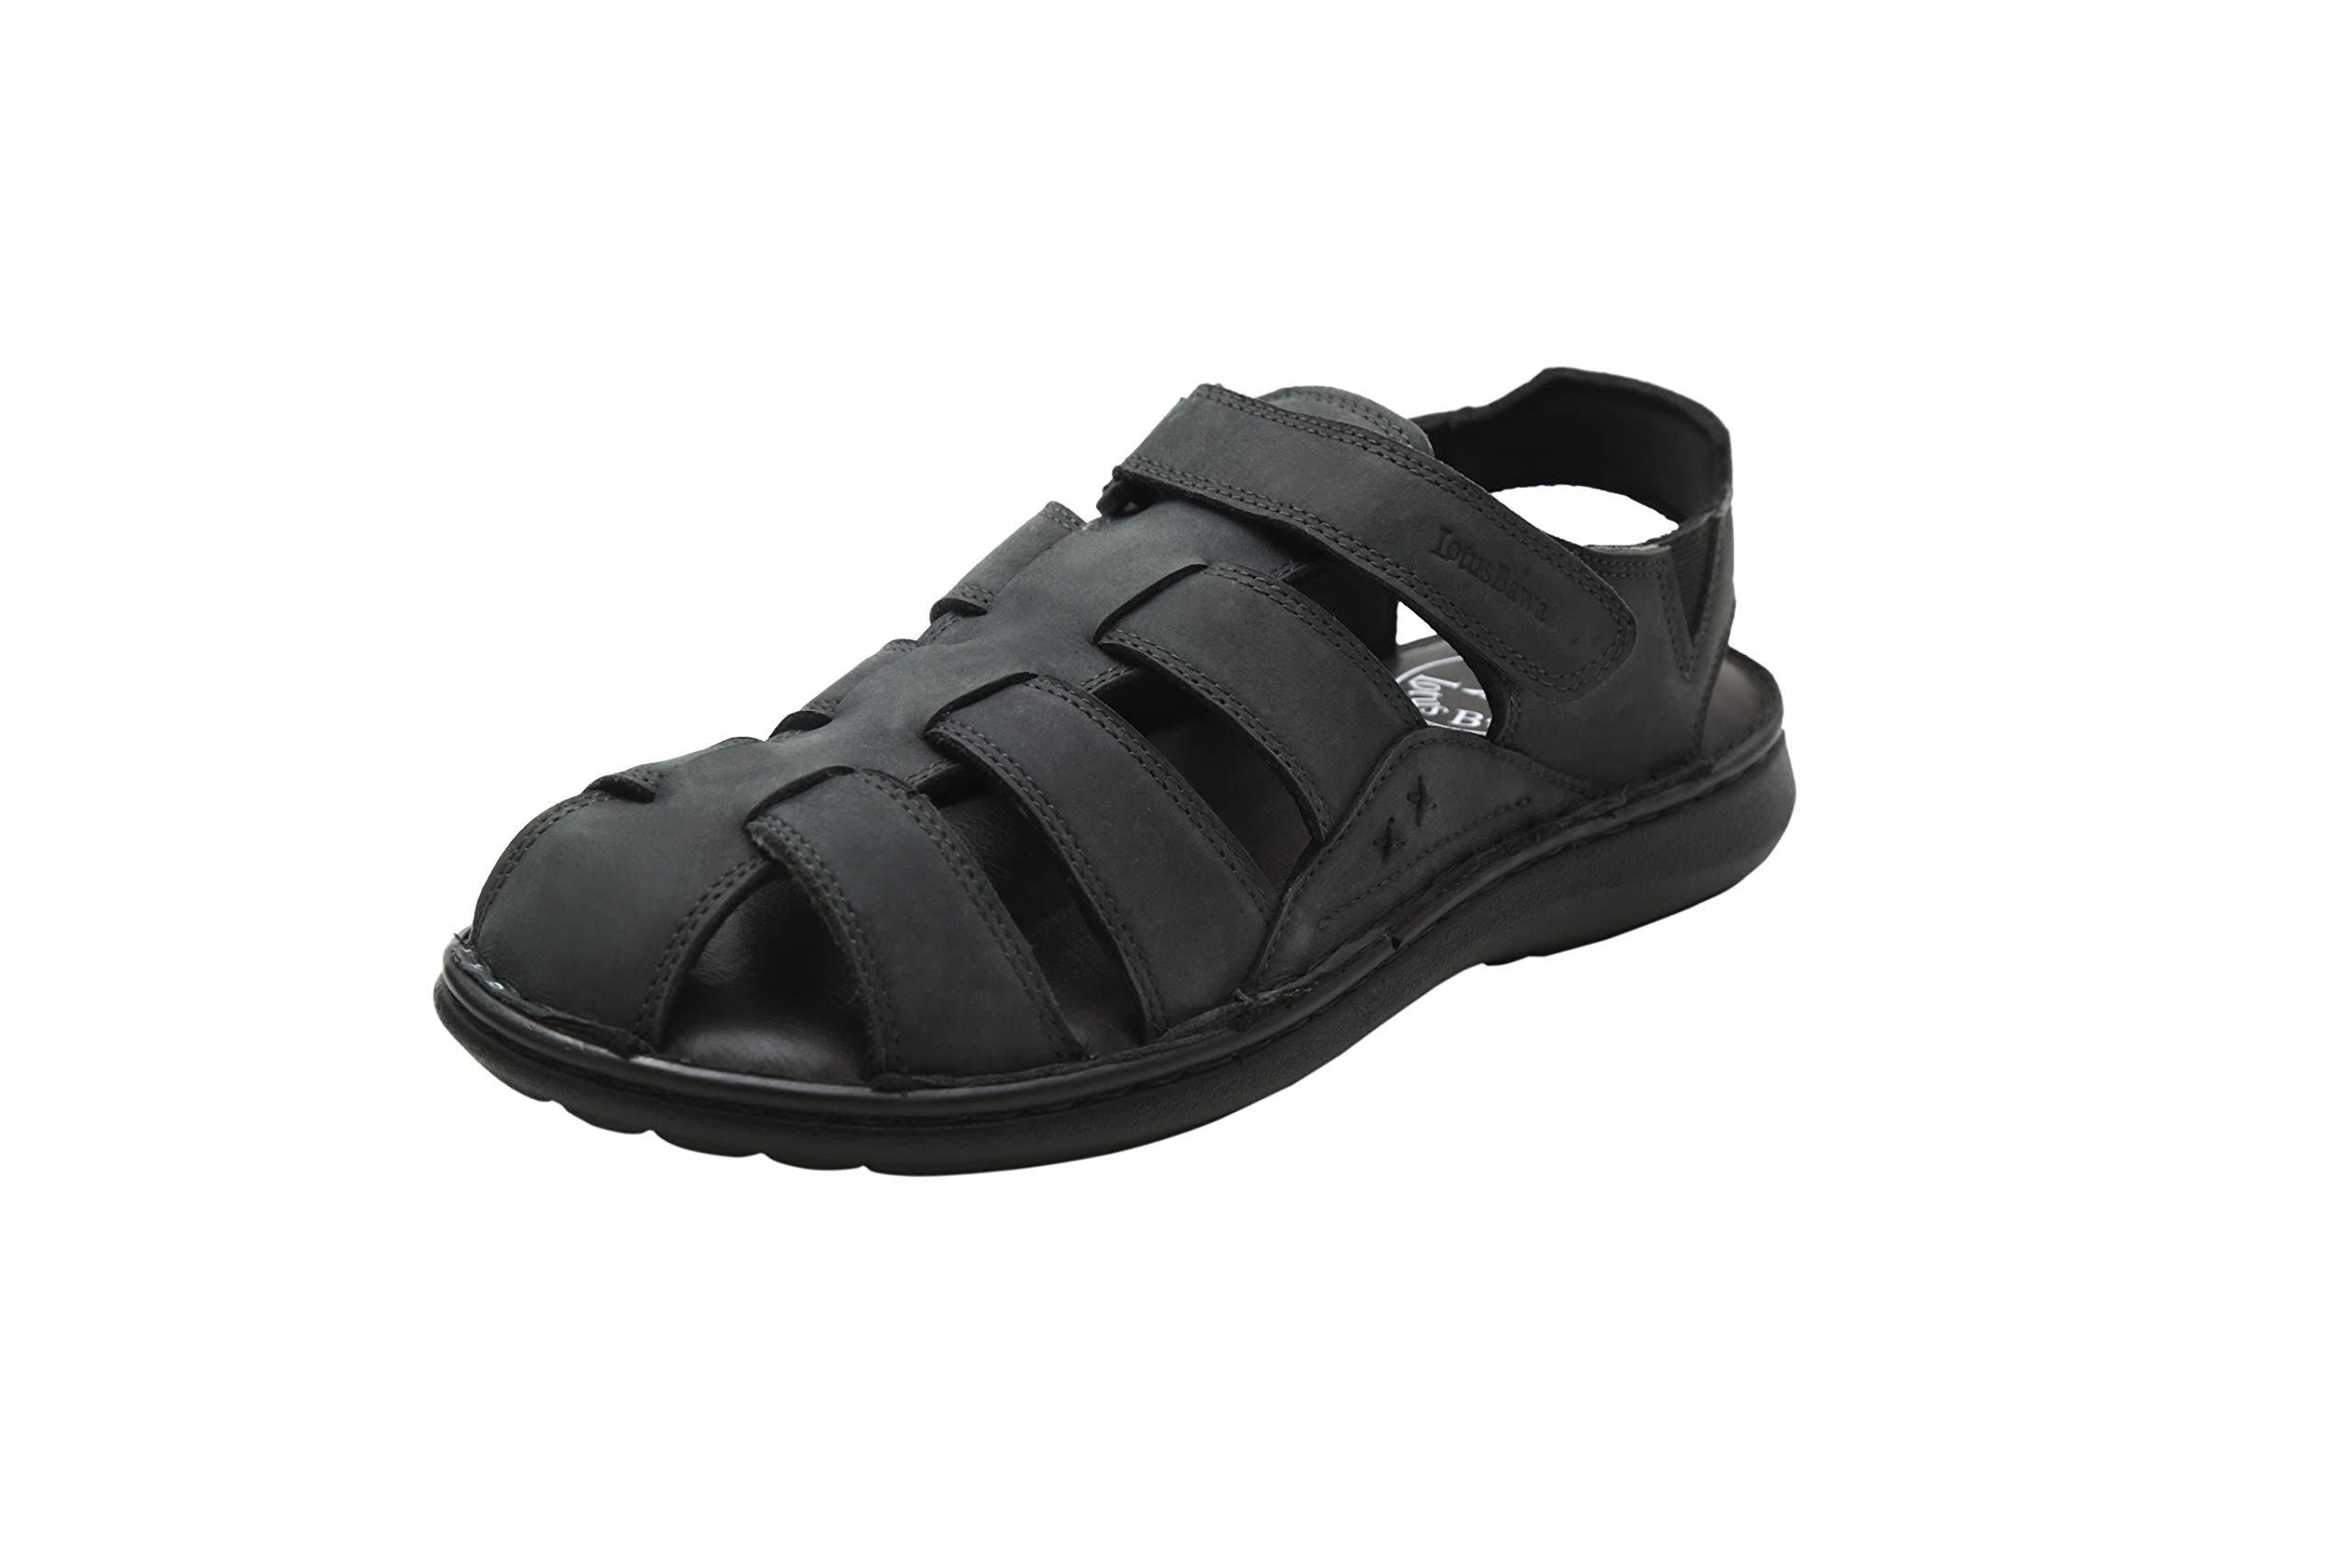 LOTUS BAWA Men's Amaretto Fisherman Genuine Leather Breathable Sandals Non-Slip Adjustable Summer Beach Wear Slippers-Black